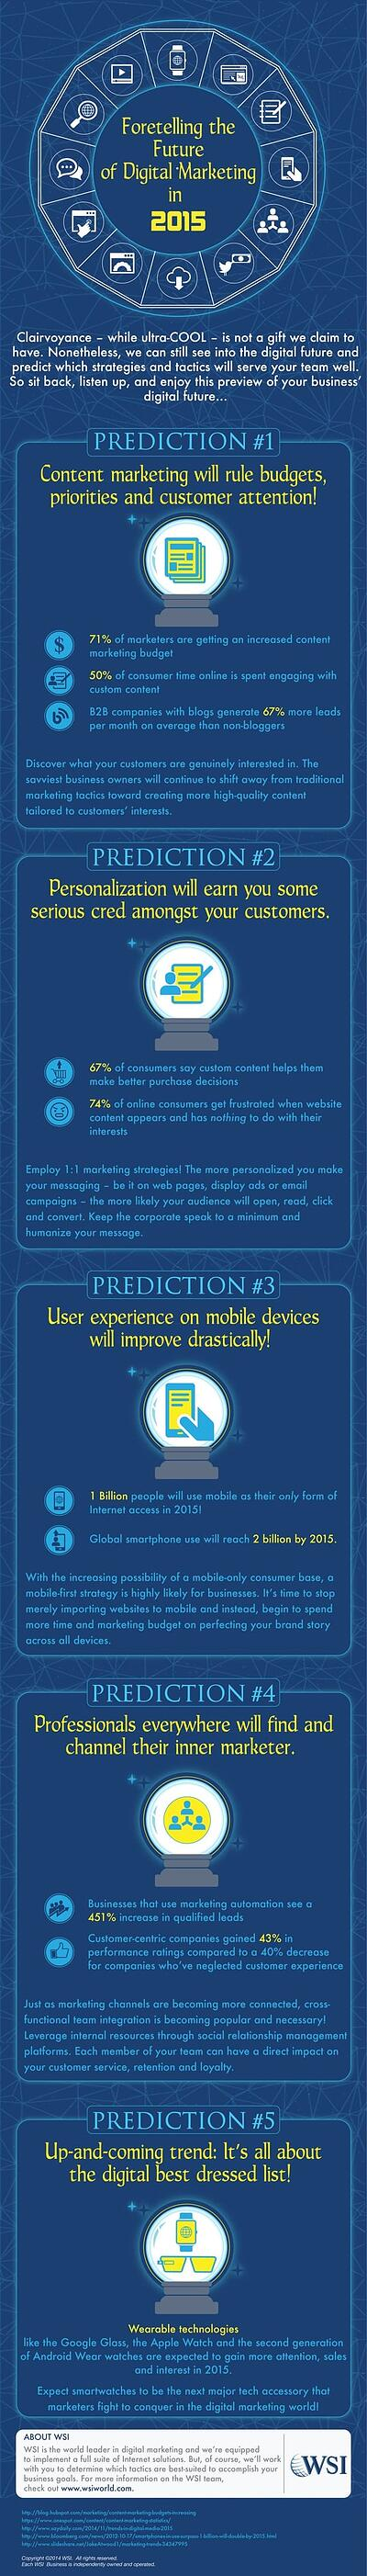 WSI World Blog - Foretelling The Future Of Digital Marketing Full Infographic